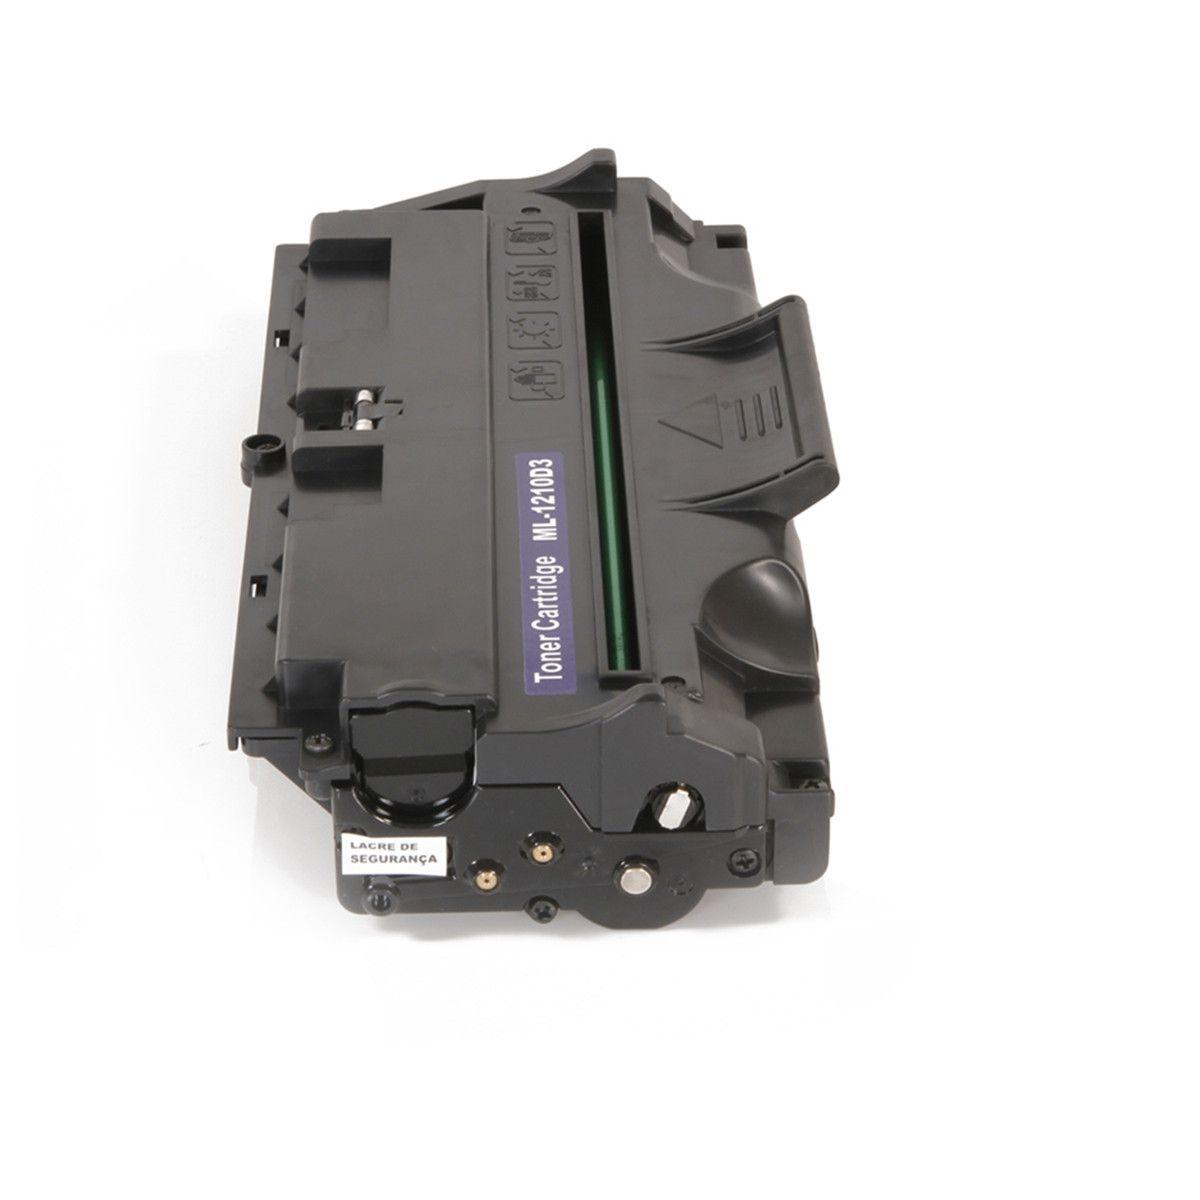 Toner compatível SAMSUNG ML1210D3   ML1010 ML1020M ML1210 ML1220M ML1250 ML1430 3.000 Páginas - Cartucho & Cia